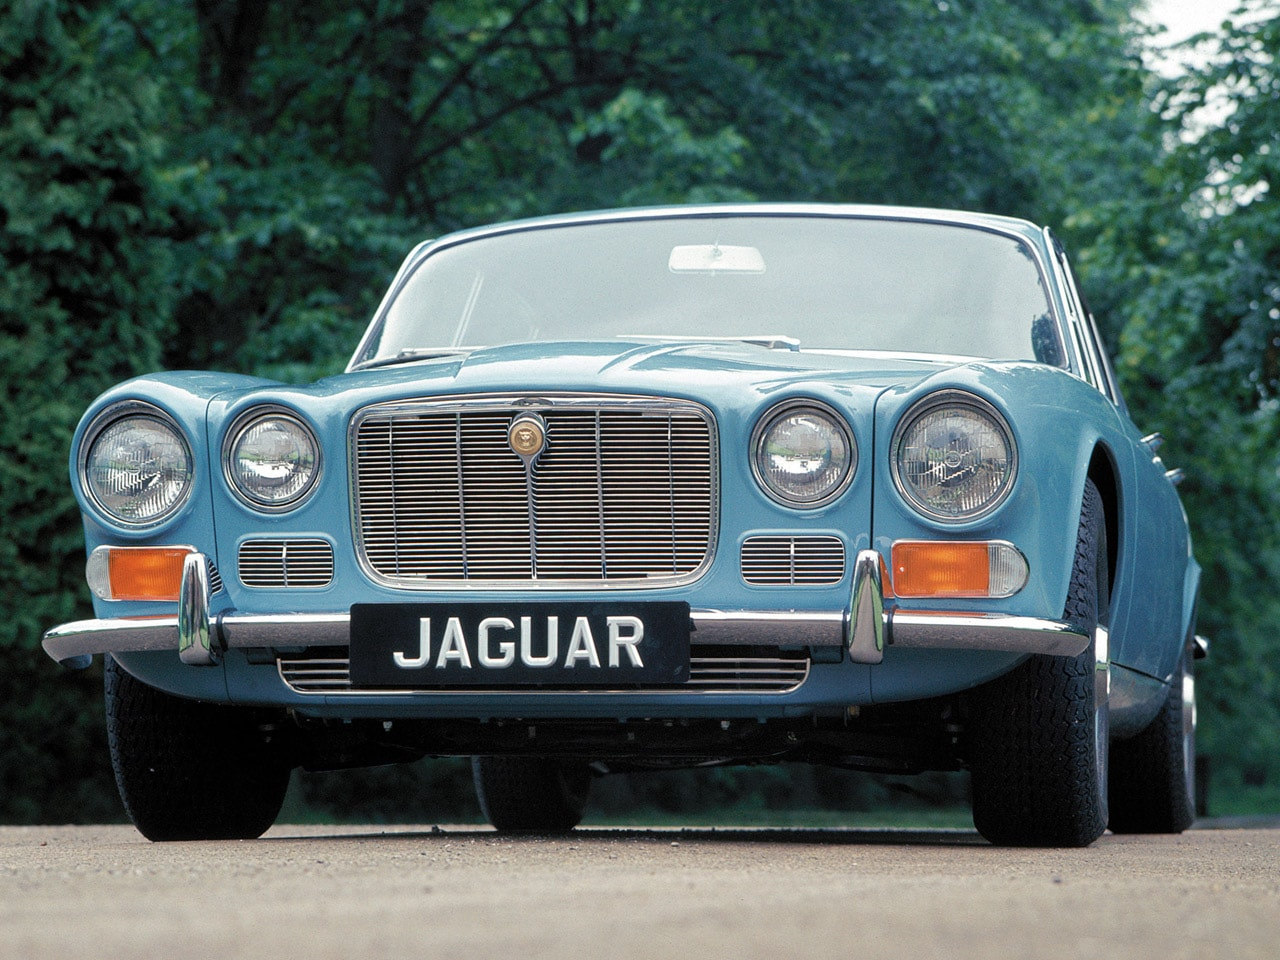 1968 Jaguar XJ6 Background